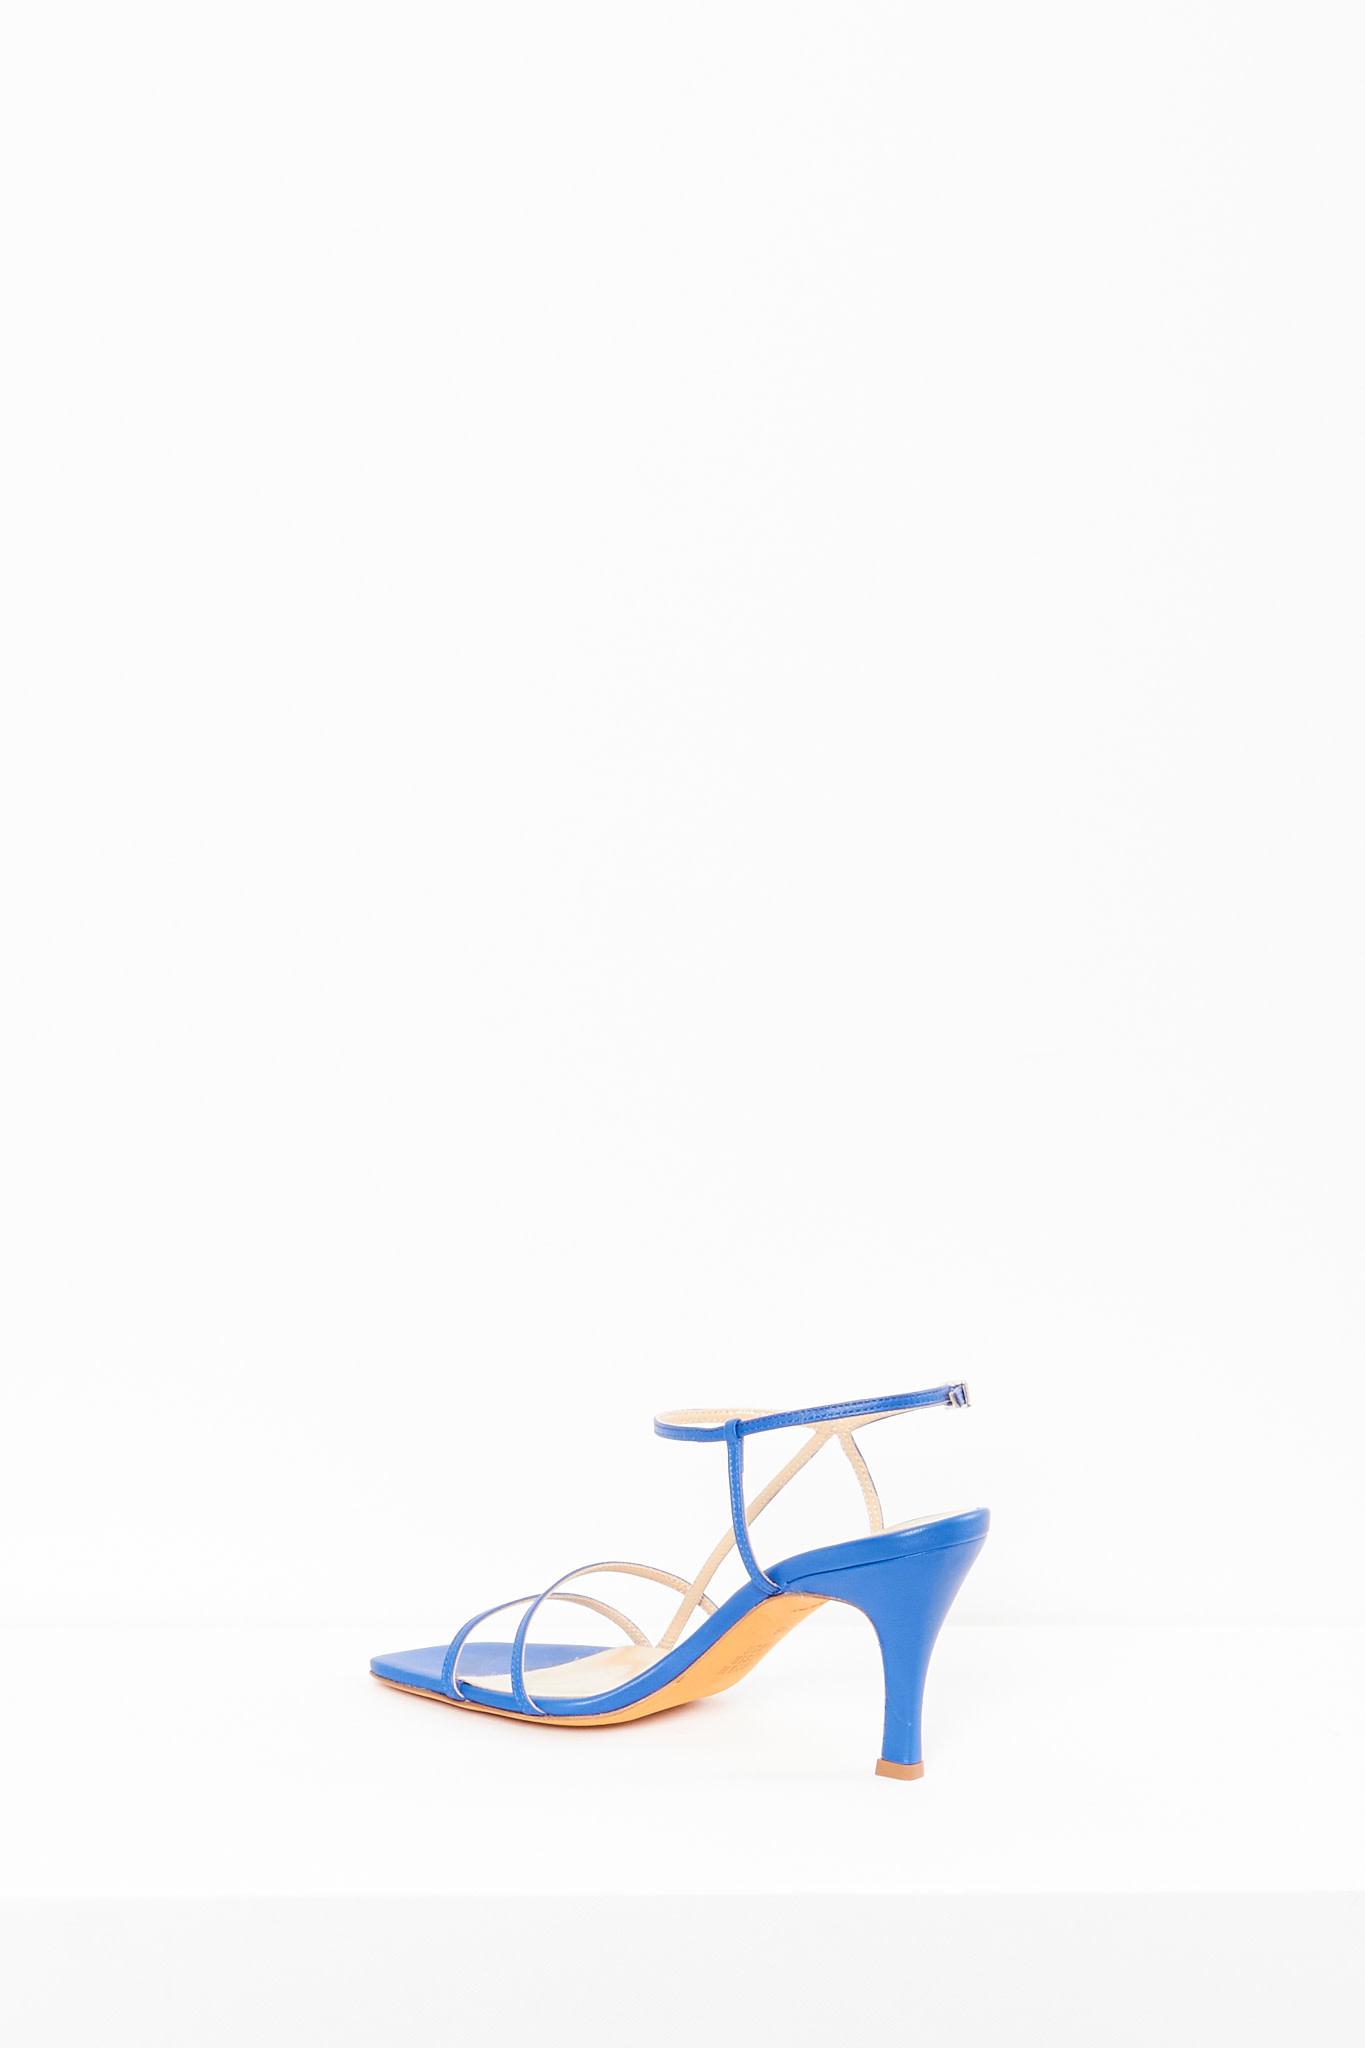 Maryam Nassir Zadeh - Irene sandals